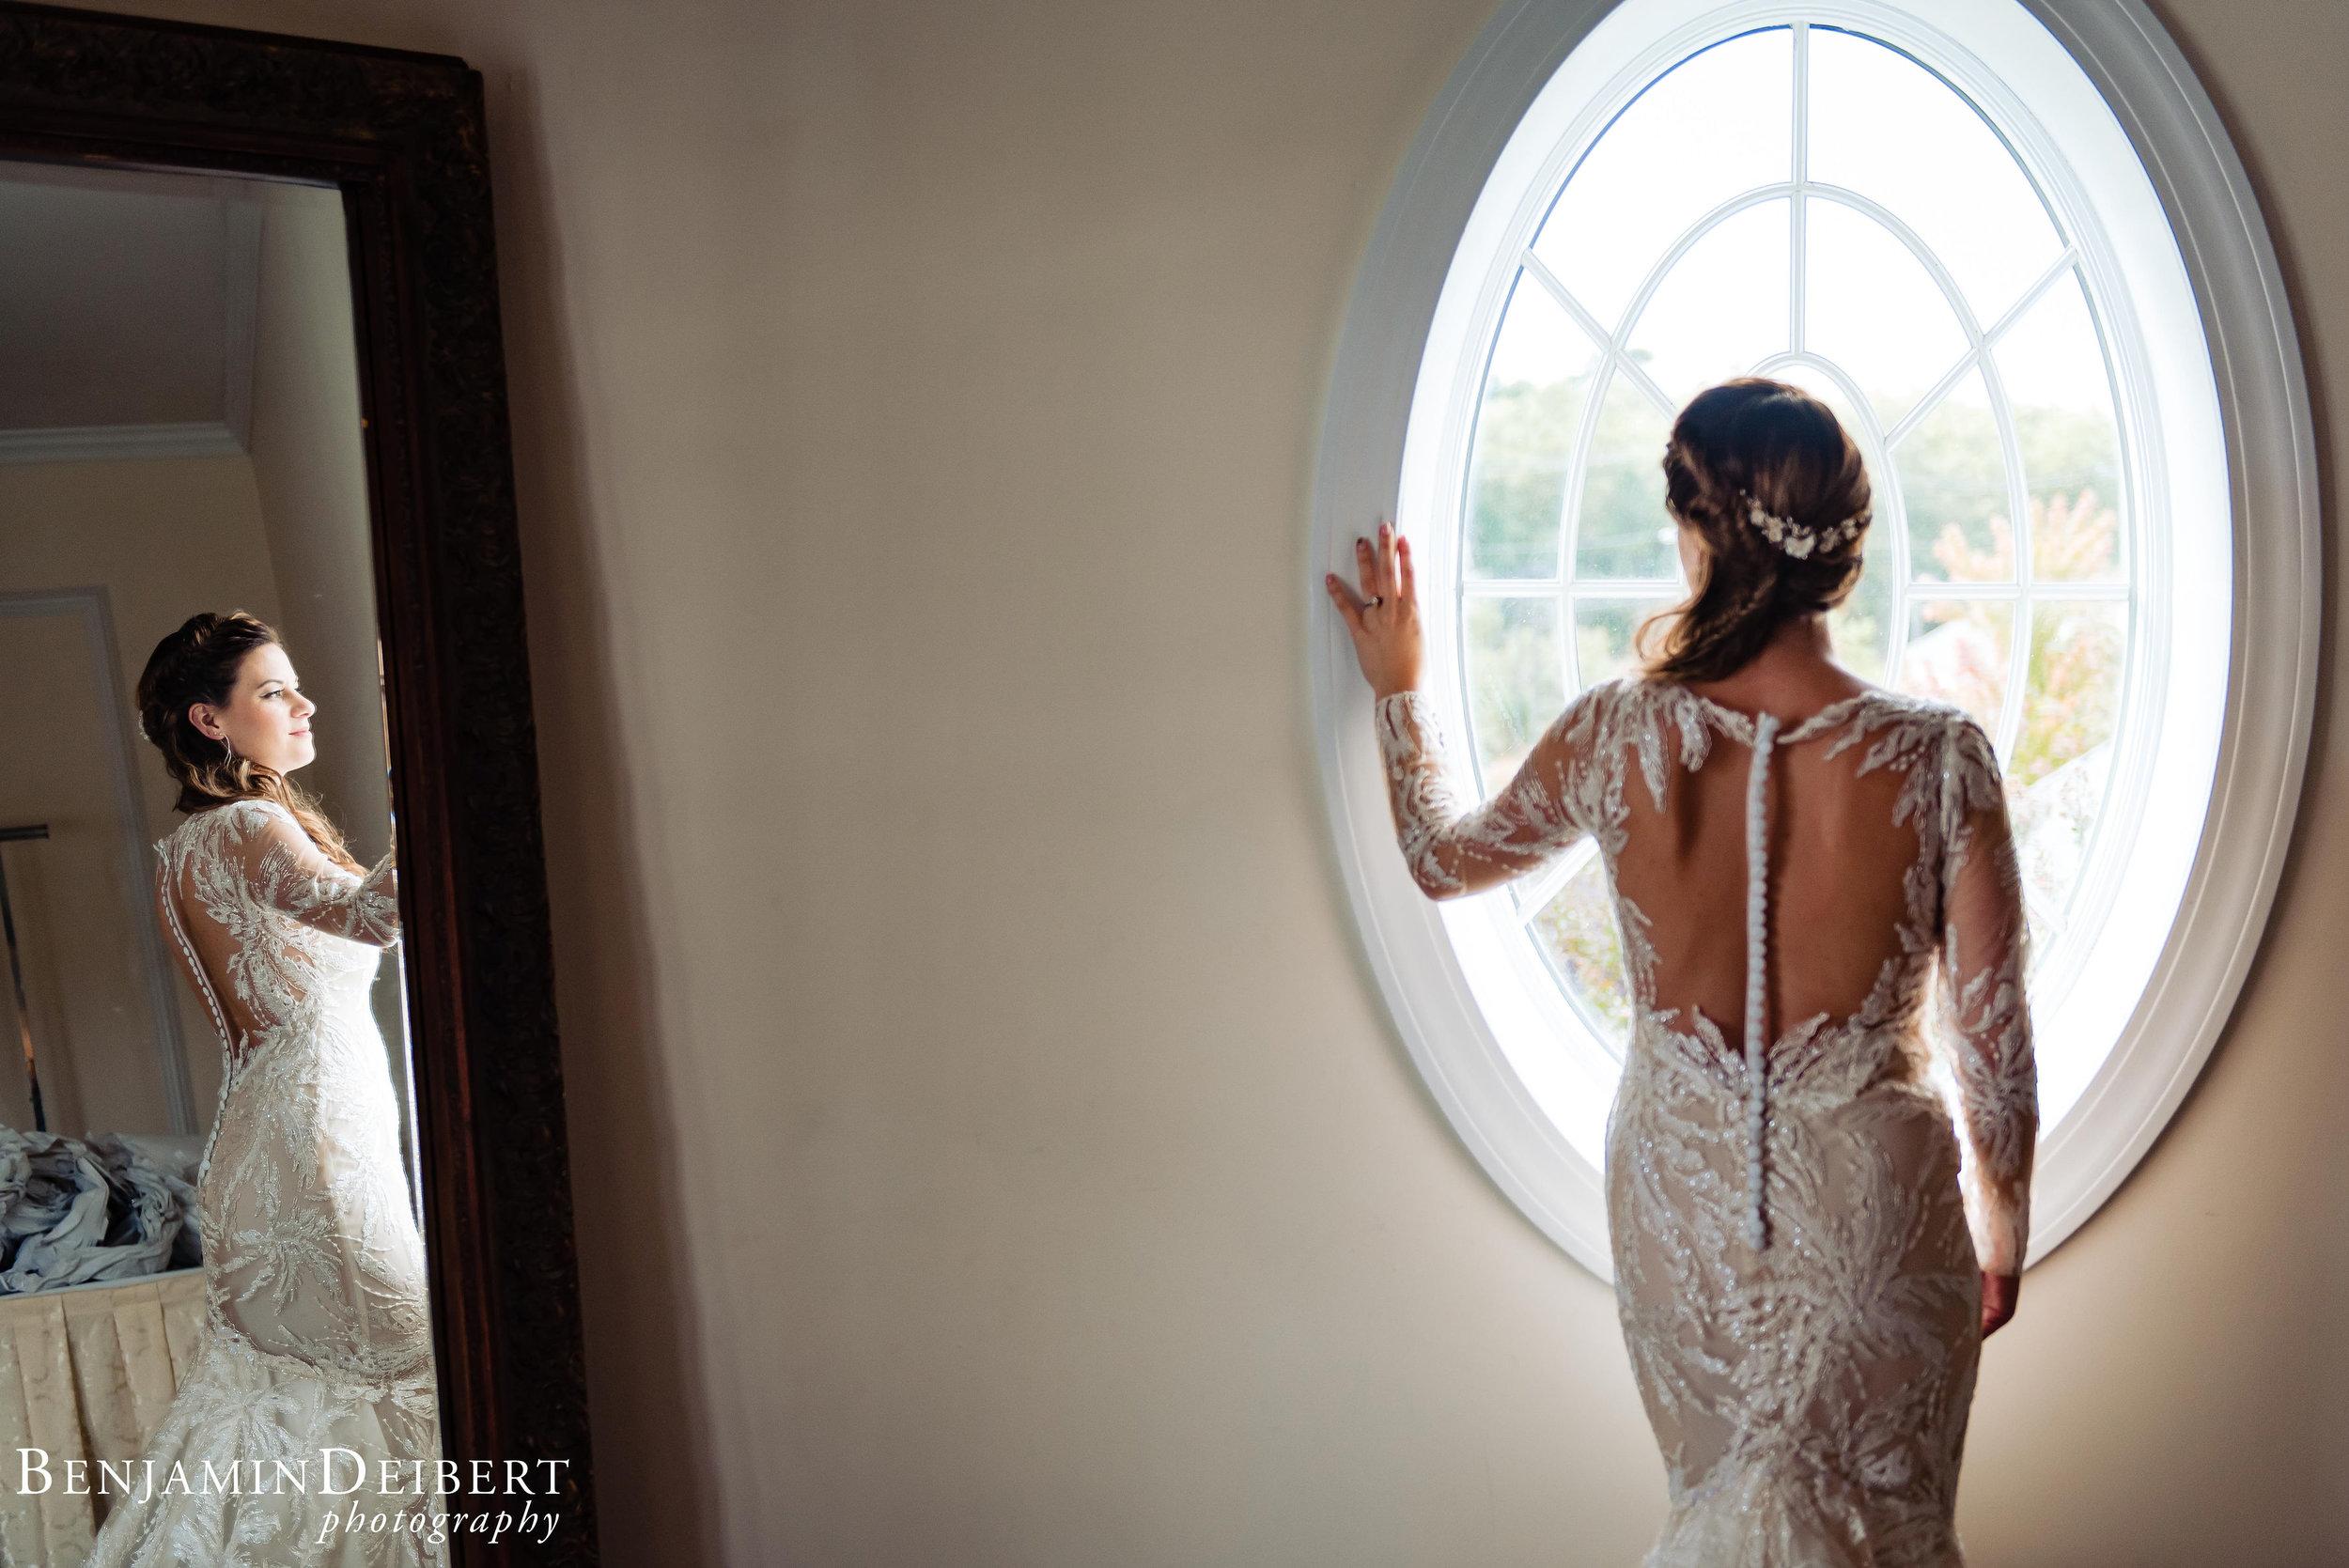 AmandaandElliott_TheCarriageHouse_Wedding-14.jpg